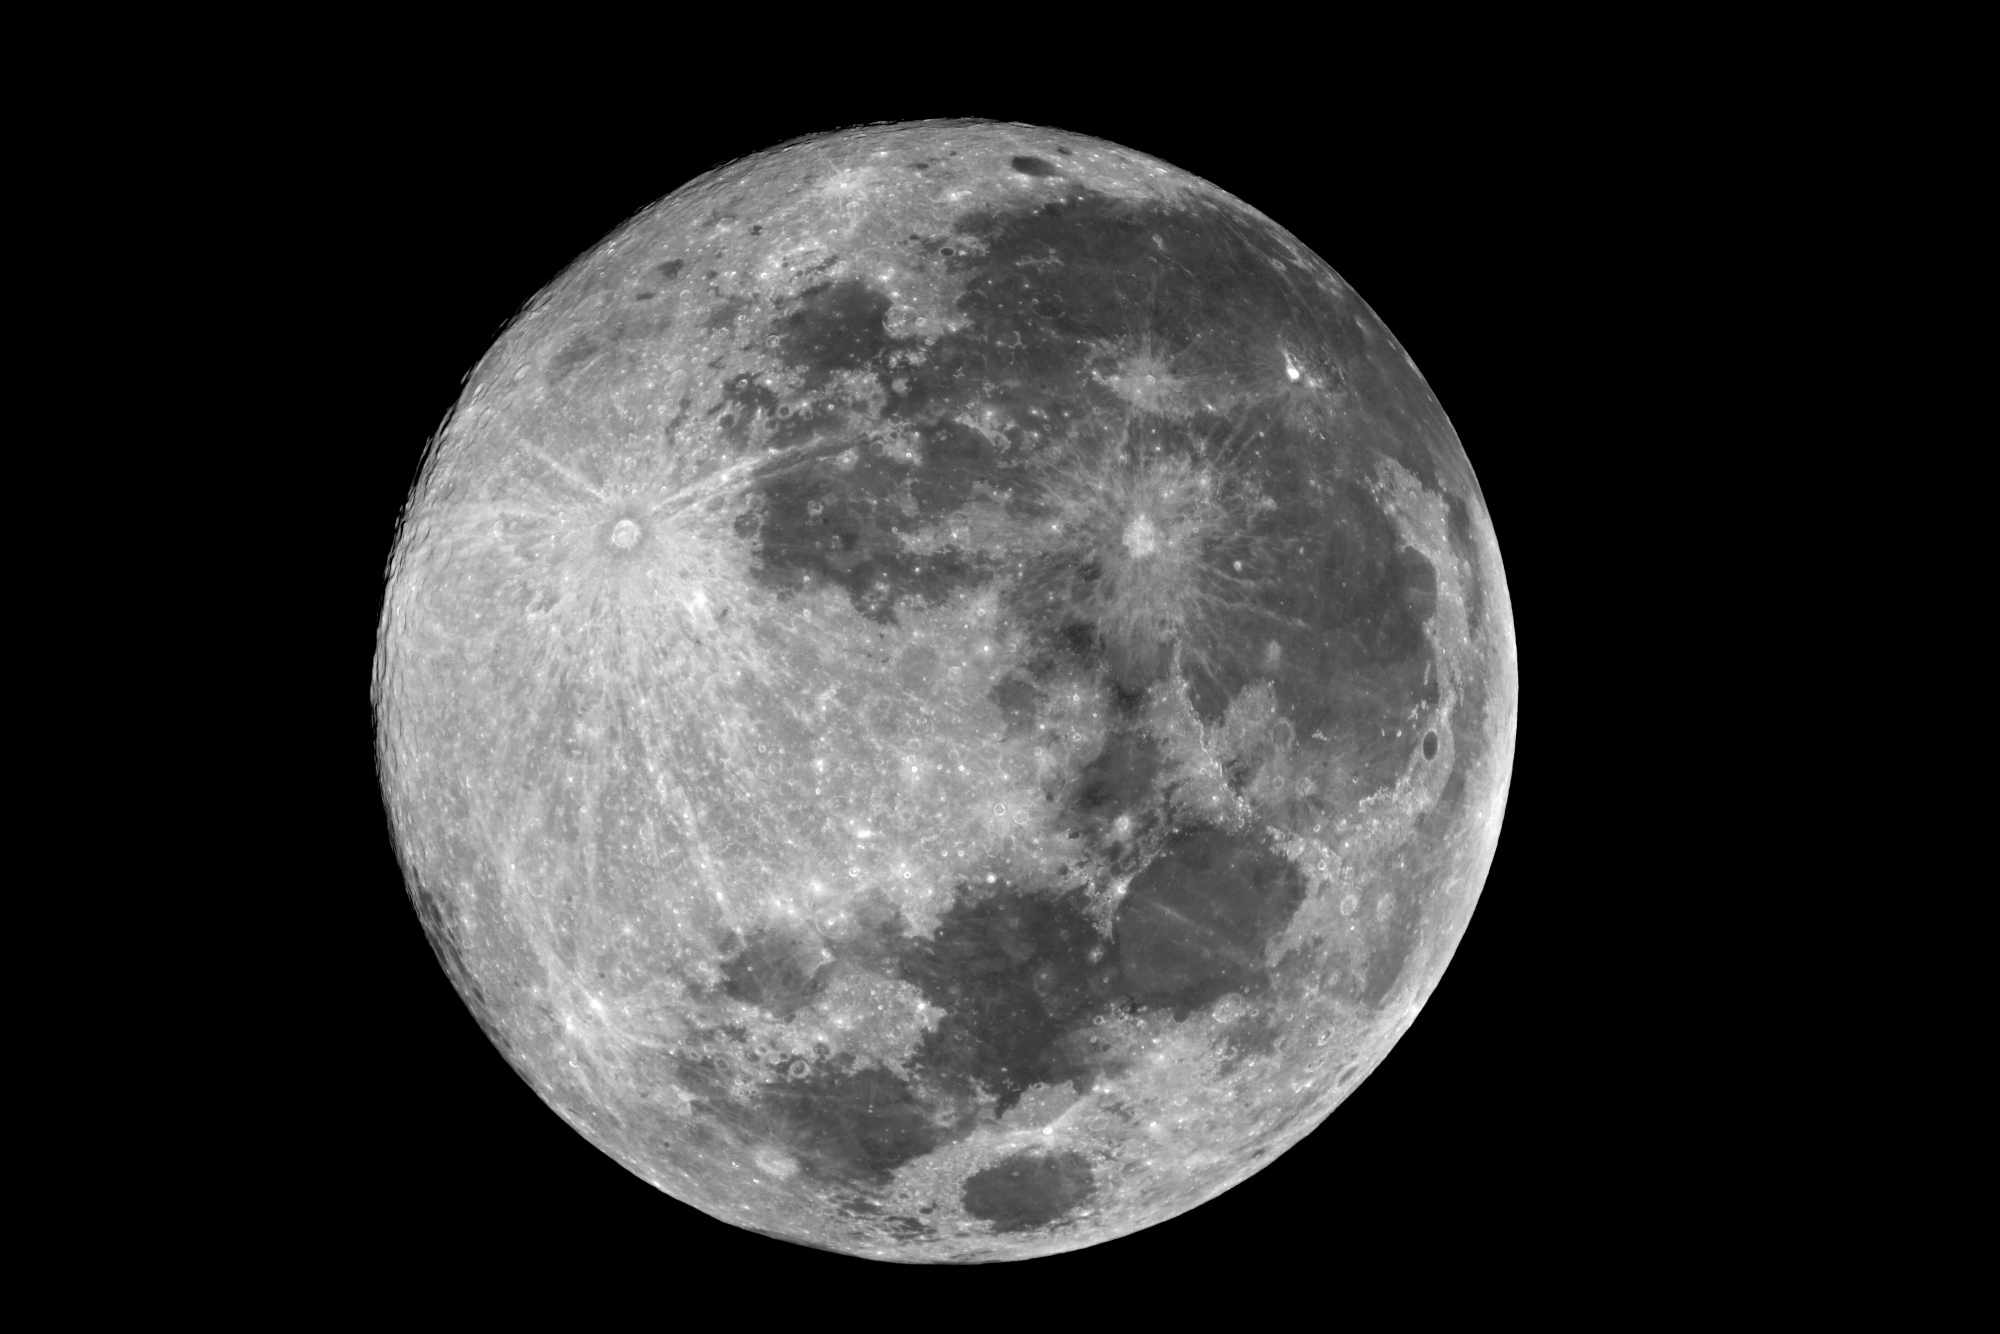 S-Lune du 080420 luminiére moyens 1,1.jpg